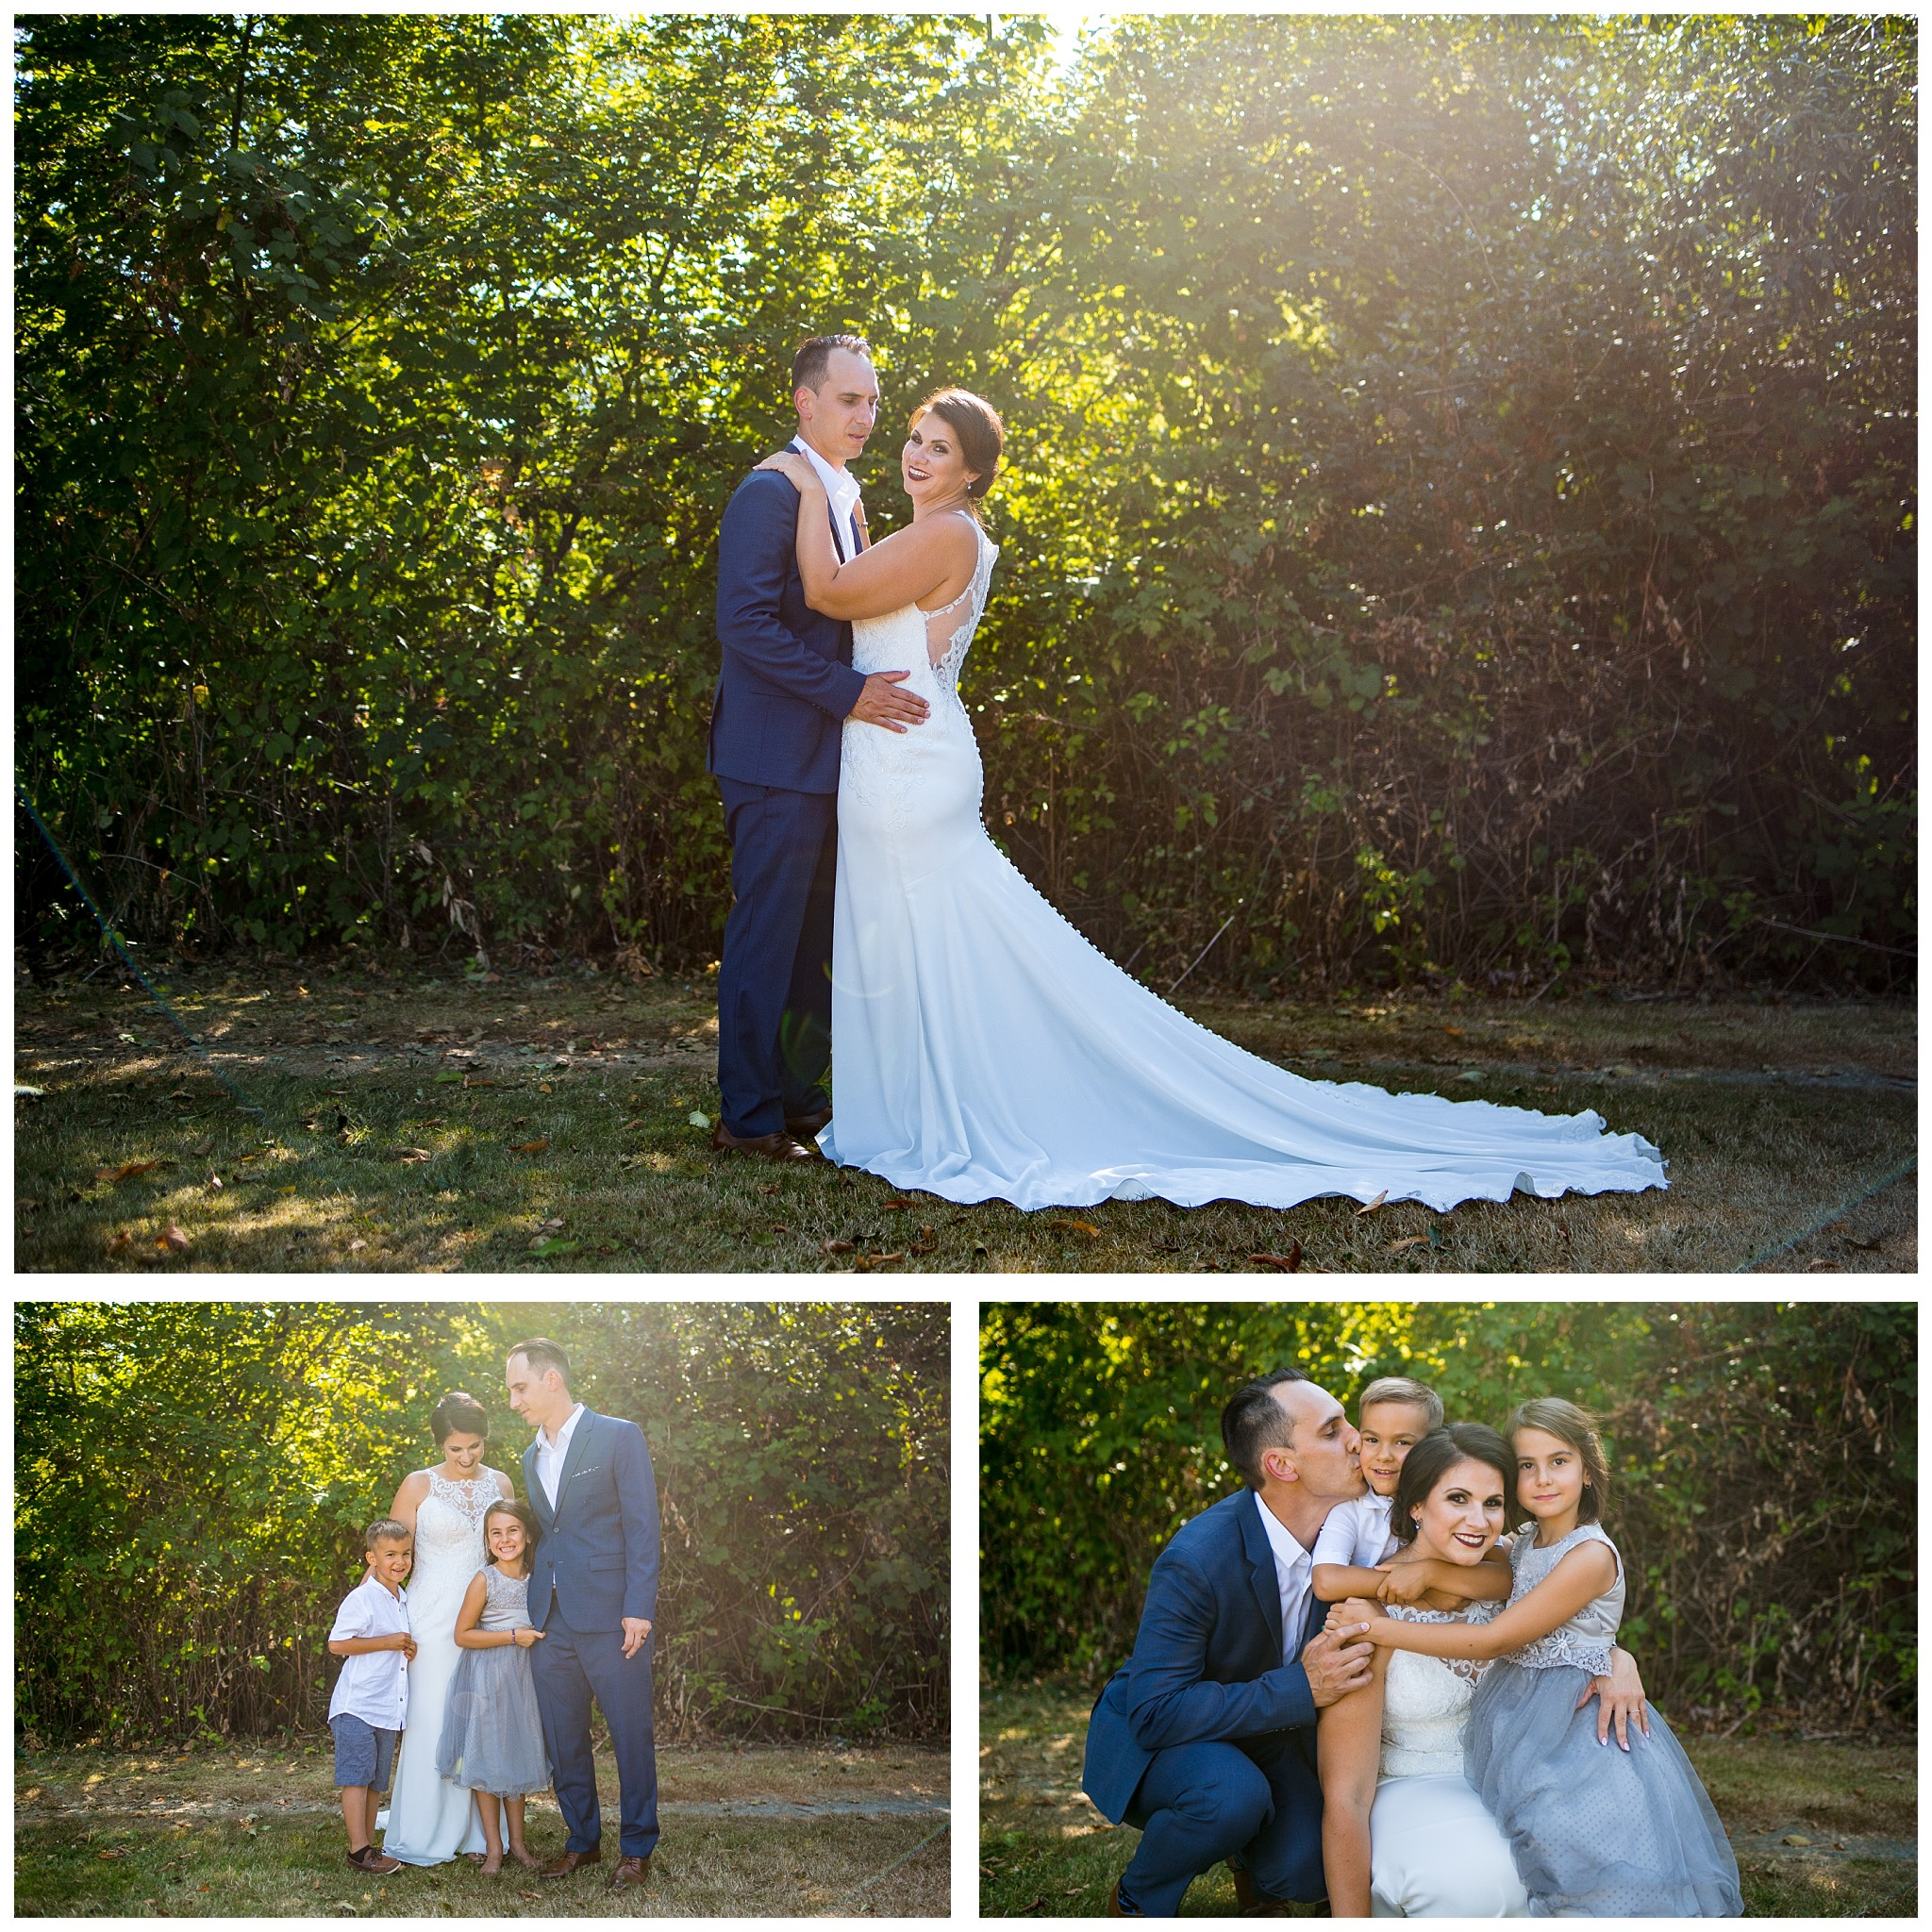 Aldergrove backyard summer wedding photographer bc canada outdoor garden inspiration family couple with kids, bride and groom_0065.jpg